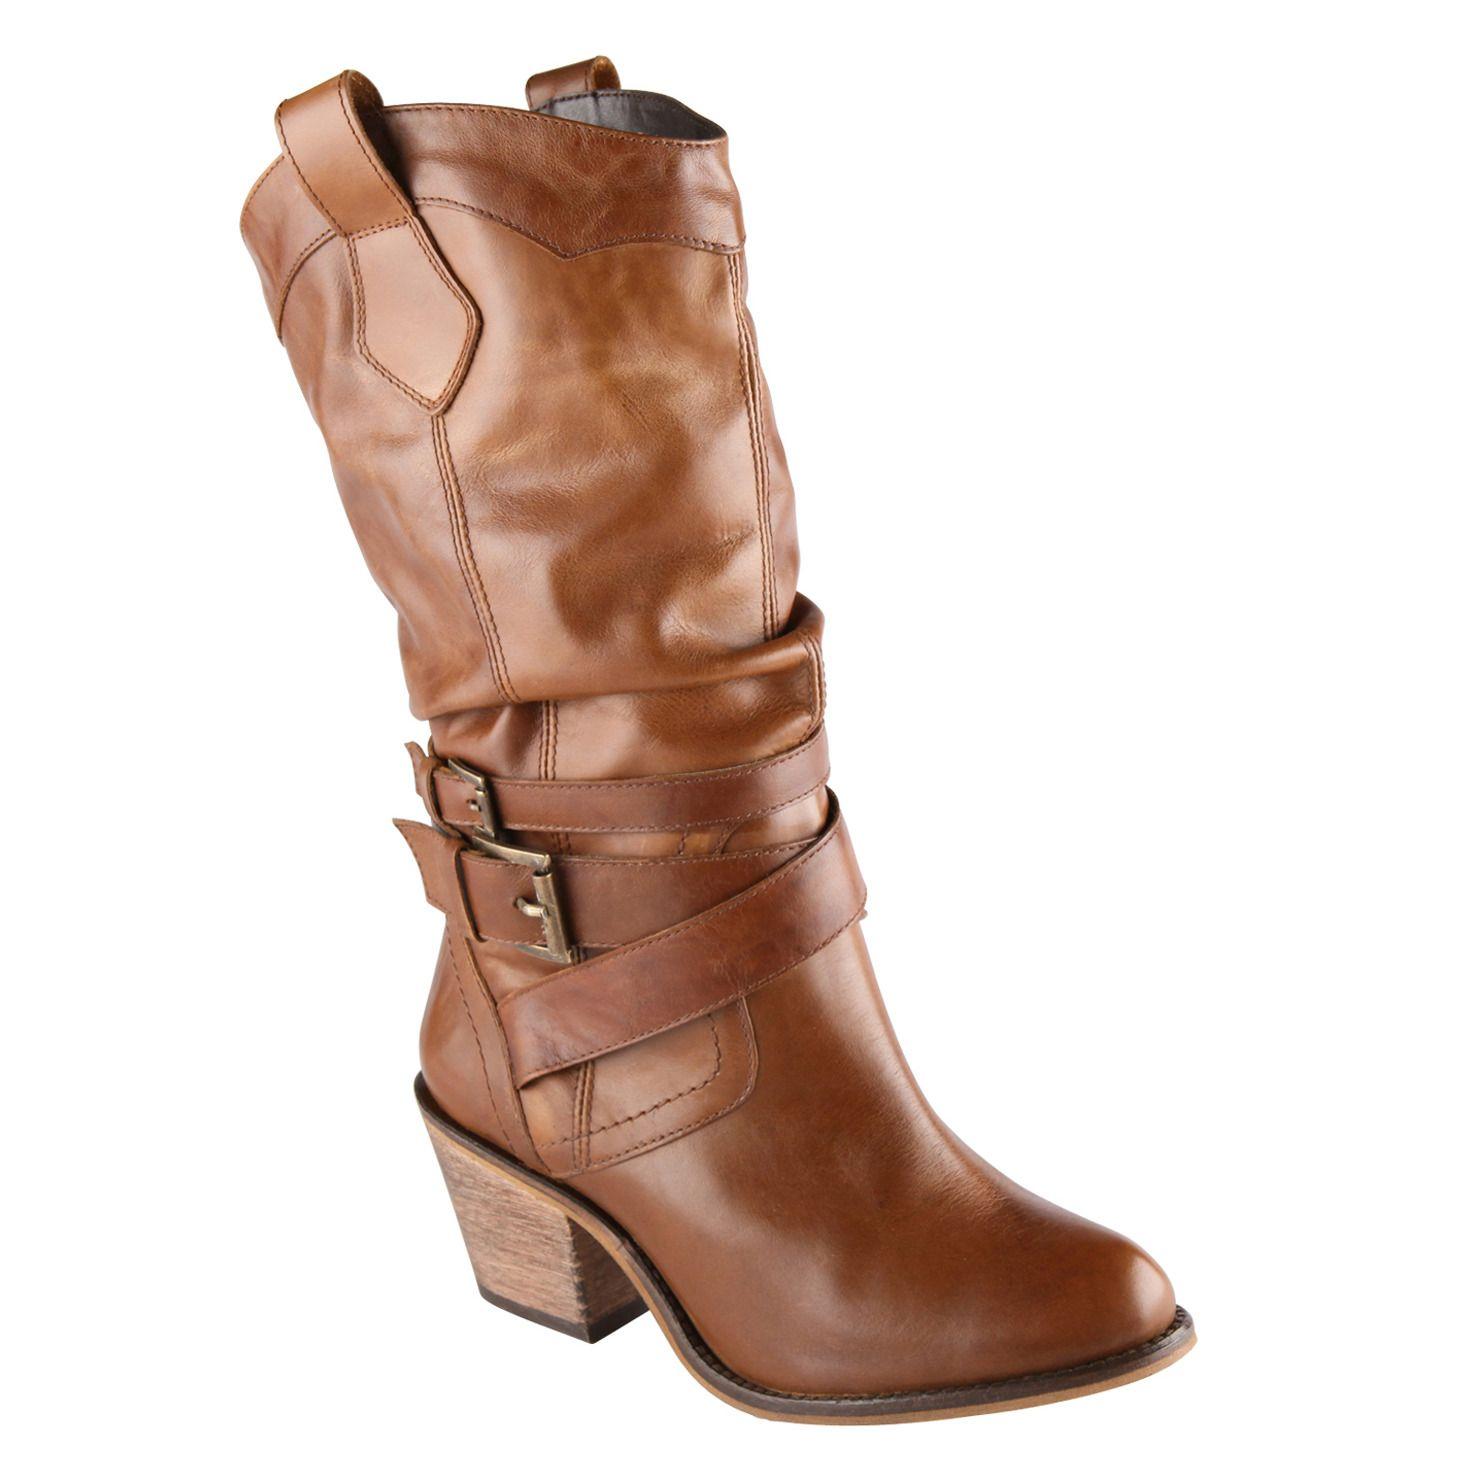 c4a3c15dd96 KALYNN - women's tall boots boots for sale at ALDO Shoes. #ALDO40 ...